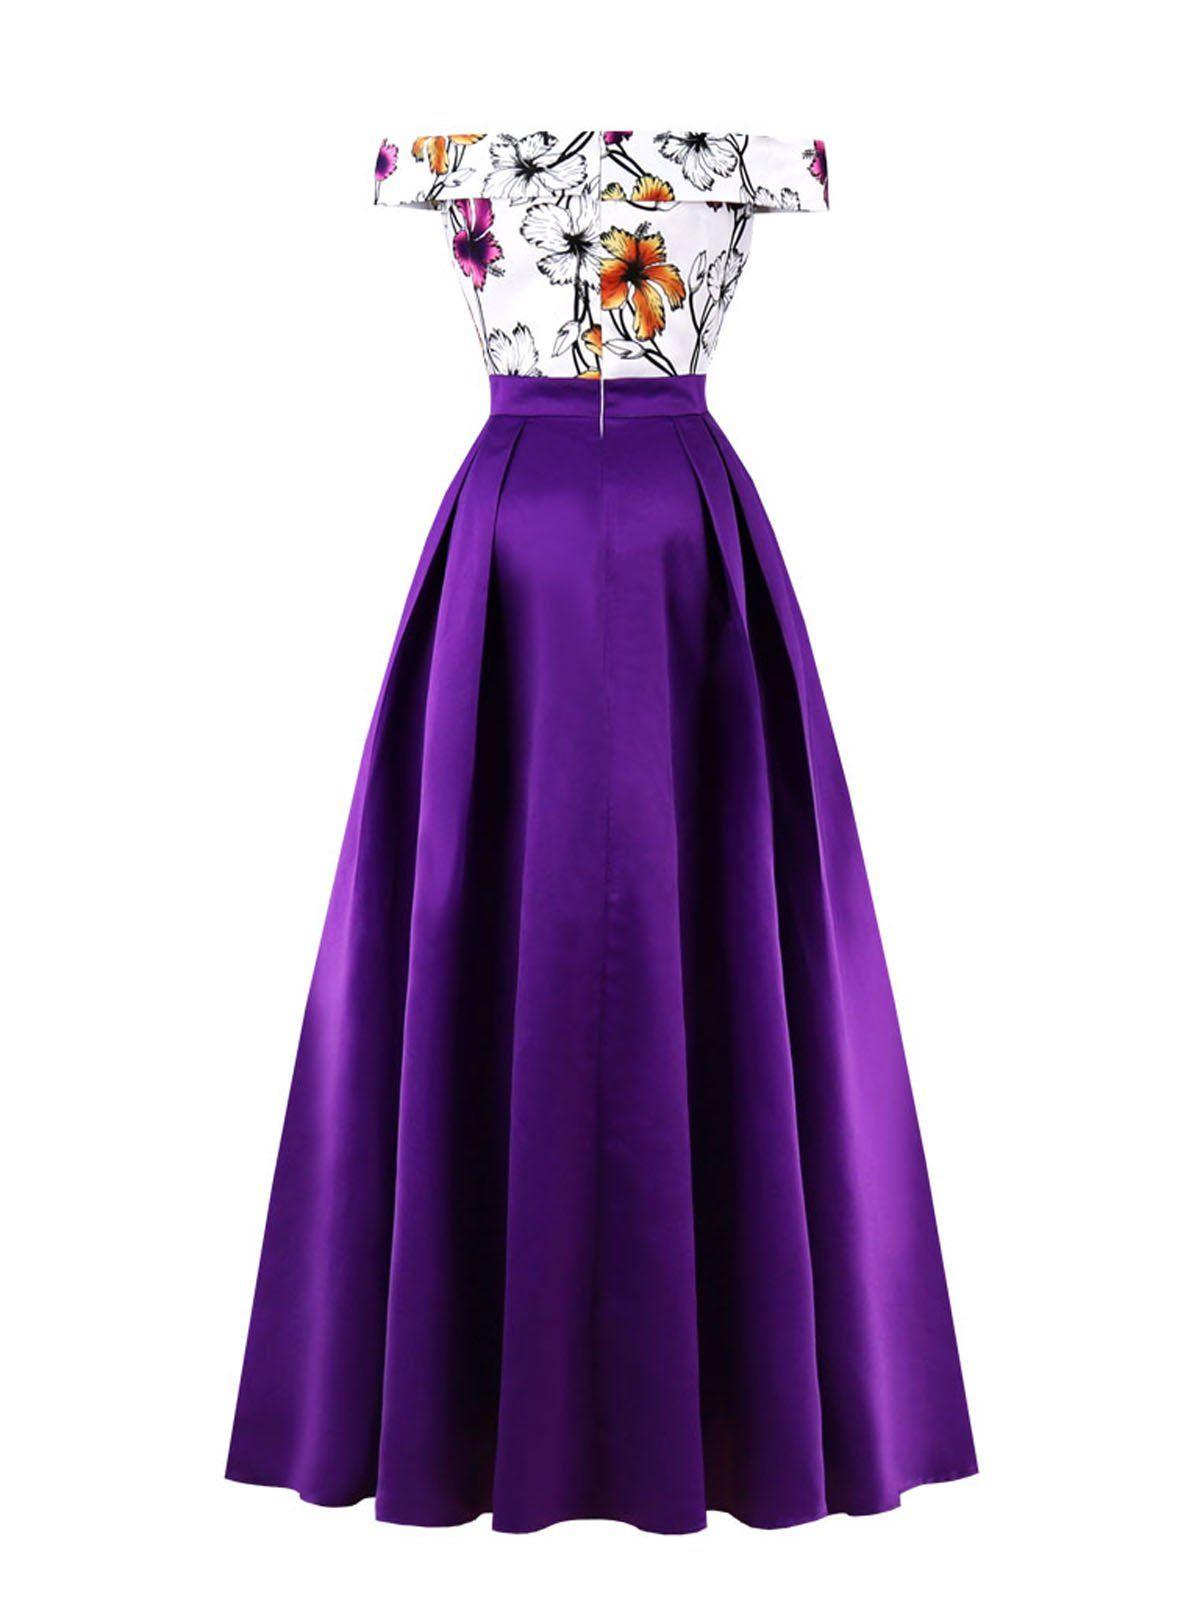 Purple Elegant Vintage Style Off Shoulder Evening Dress Retro Stage Chic Vintage Dresses And Accesso Off Shoulder Evening Dress Dresses Shoulder Maxi Dress [ 1600 x 1200 Pixel ]